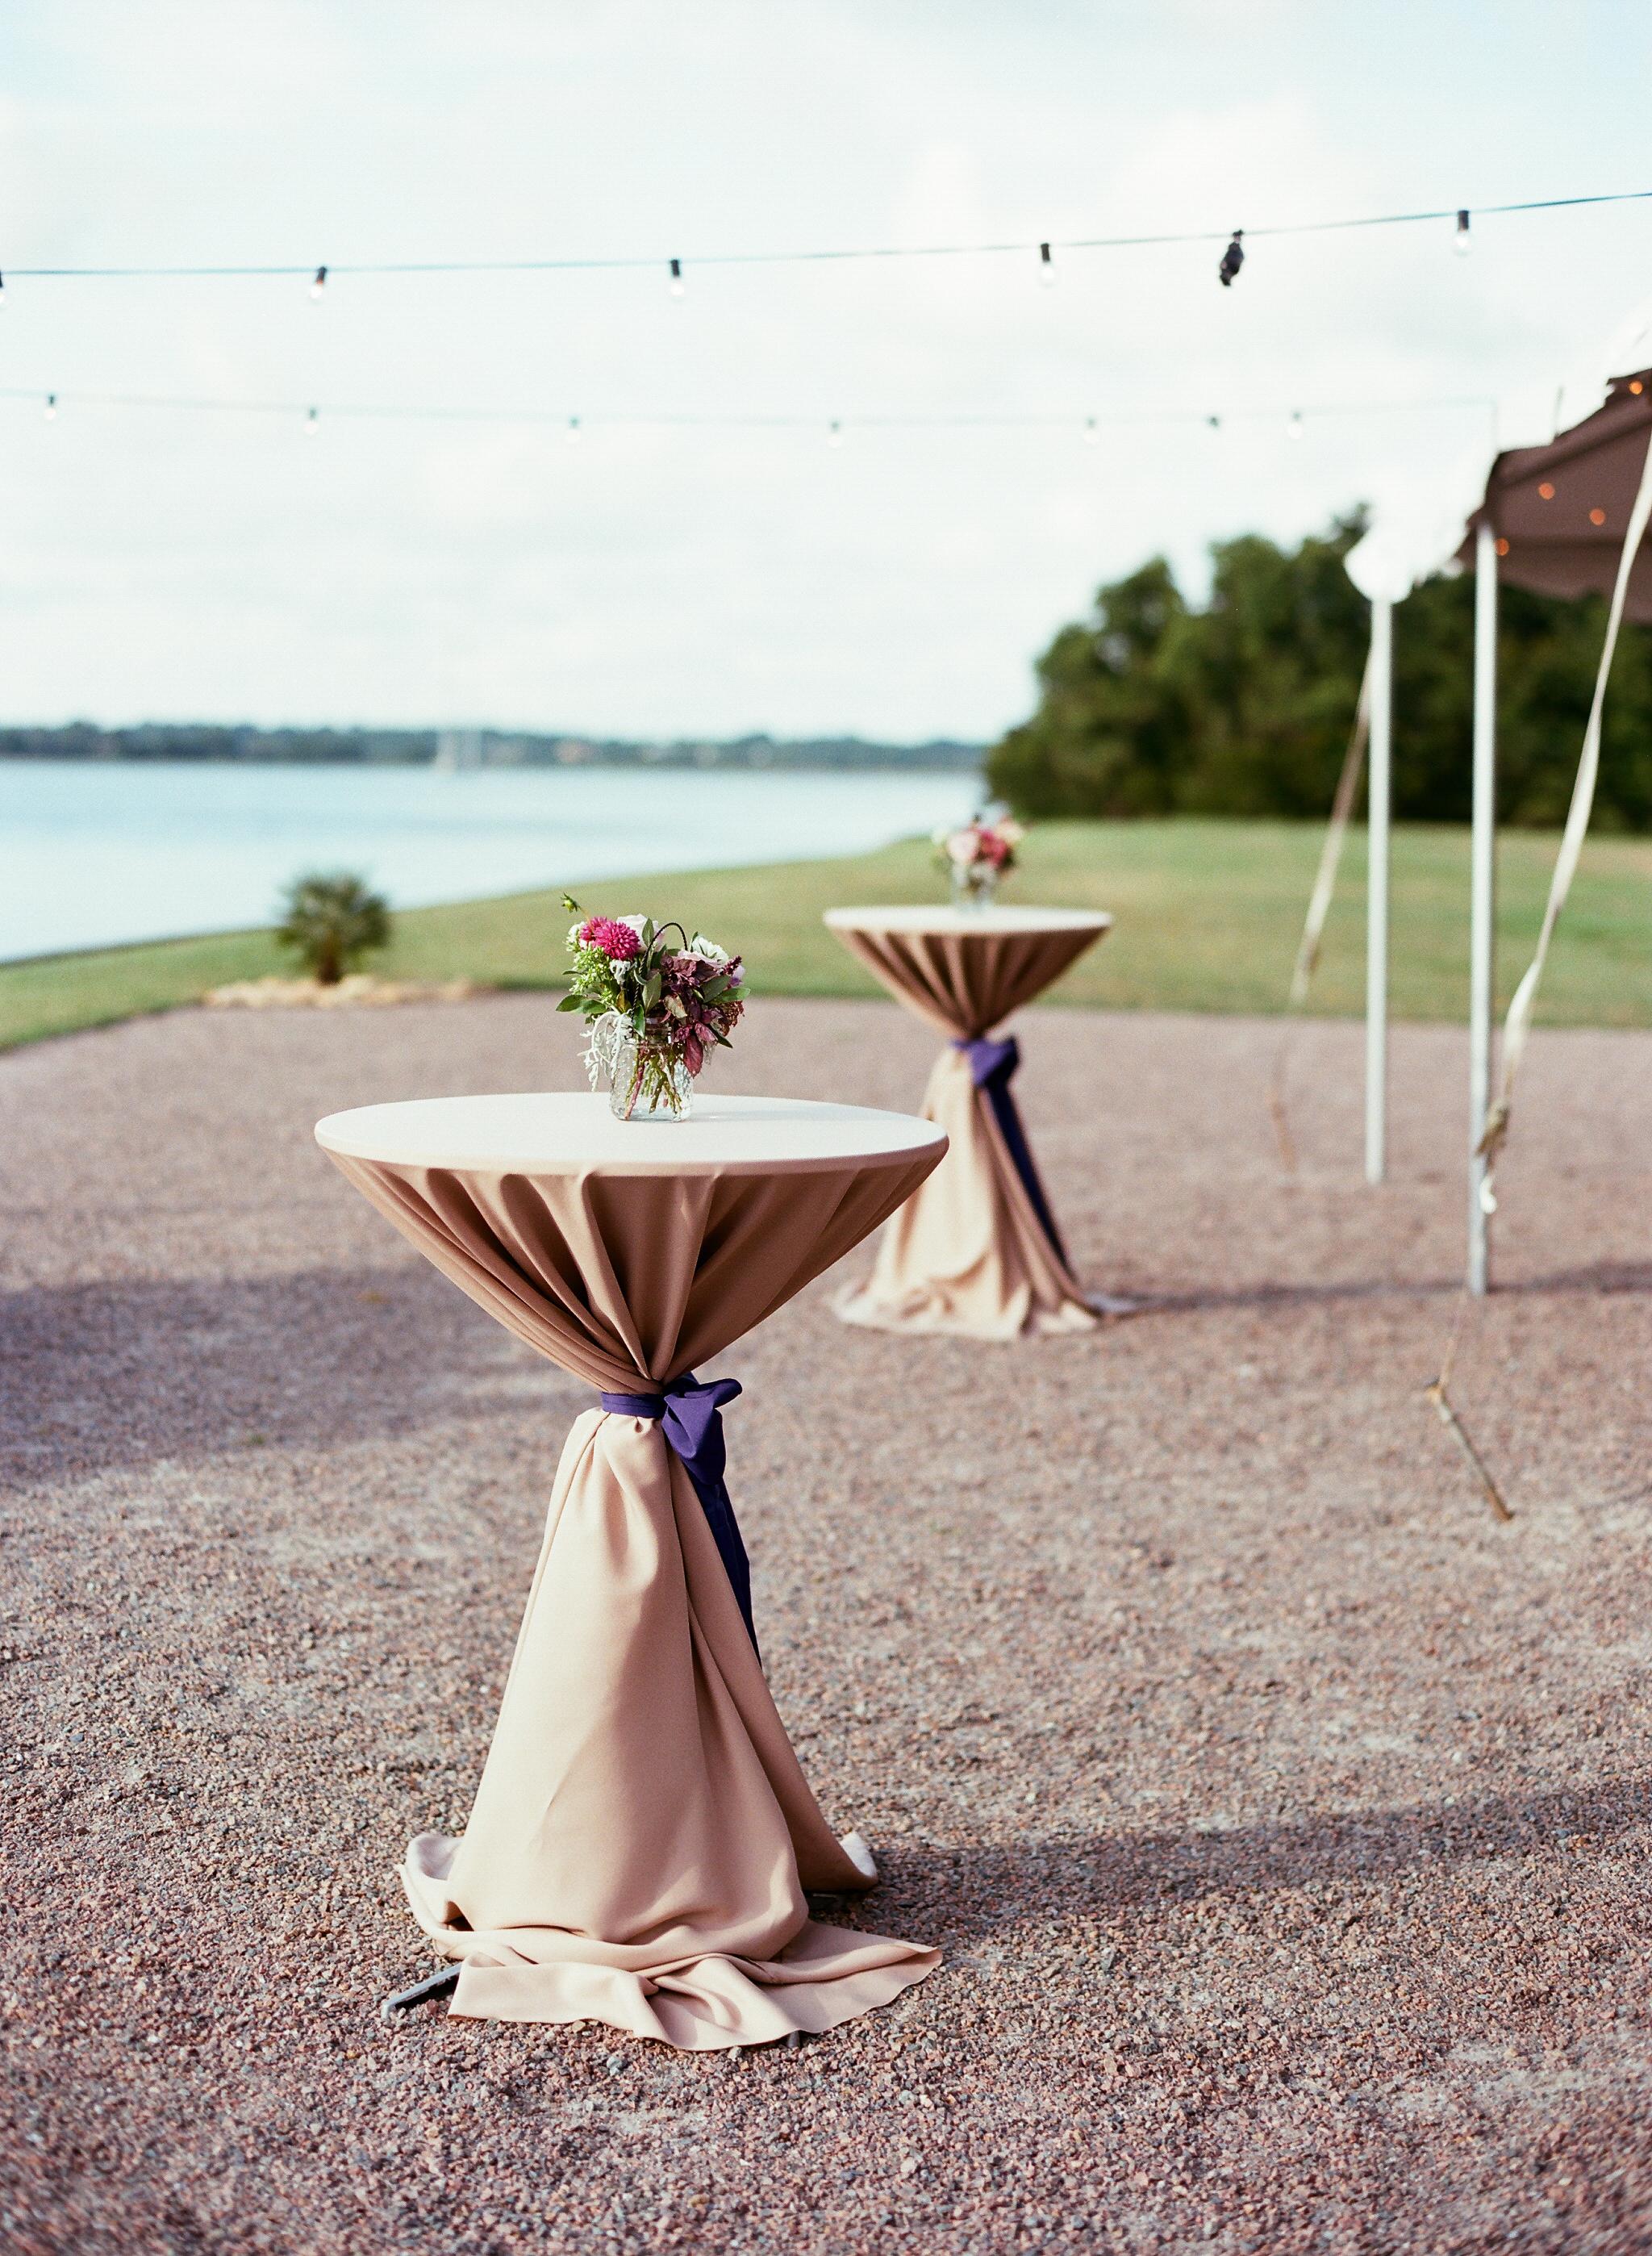 Outdoor wedding ceremony at The Island House on Johns Island SC  //  Charleston wedding photos by Lauren Jonas Photography